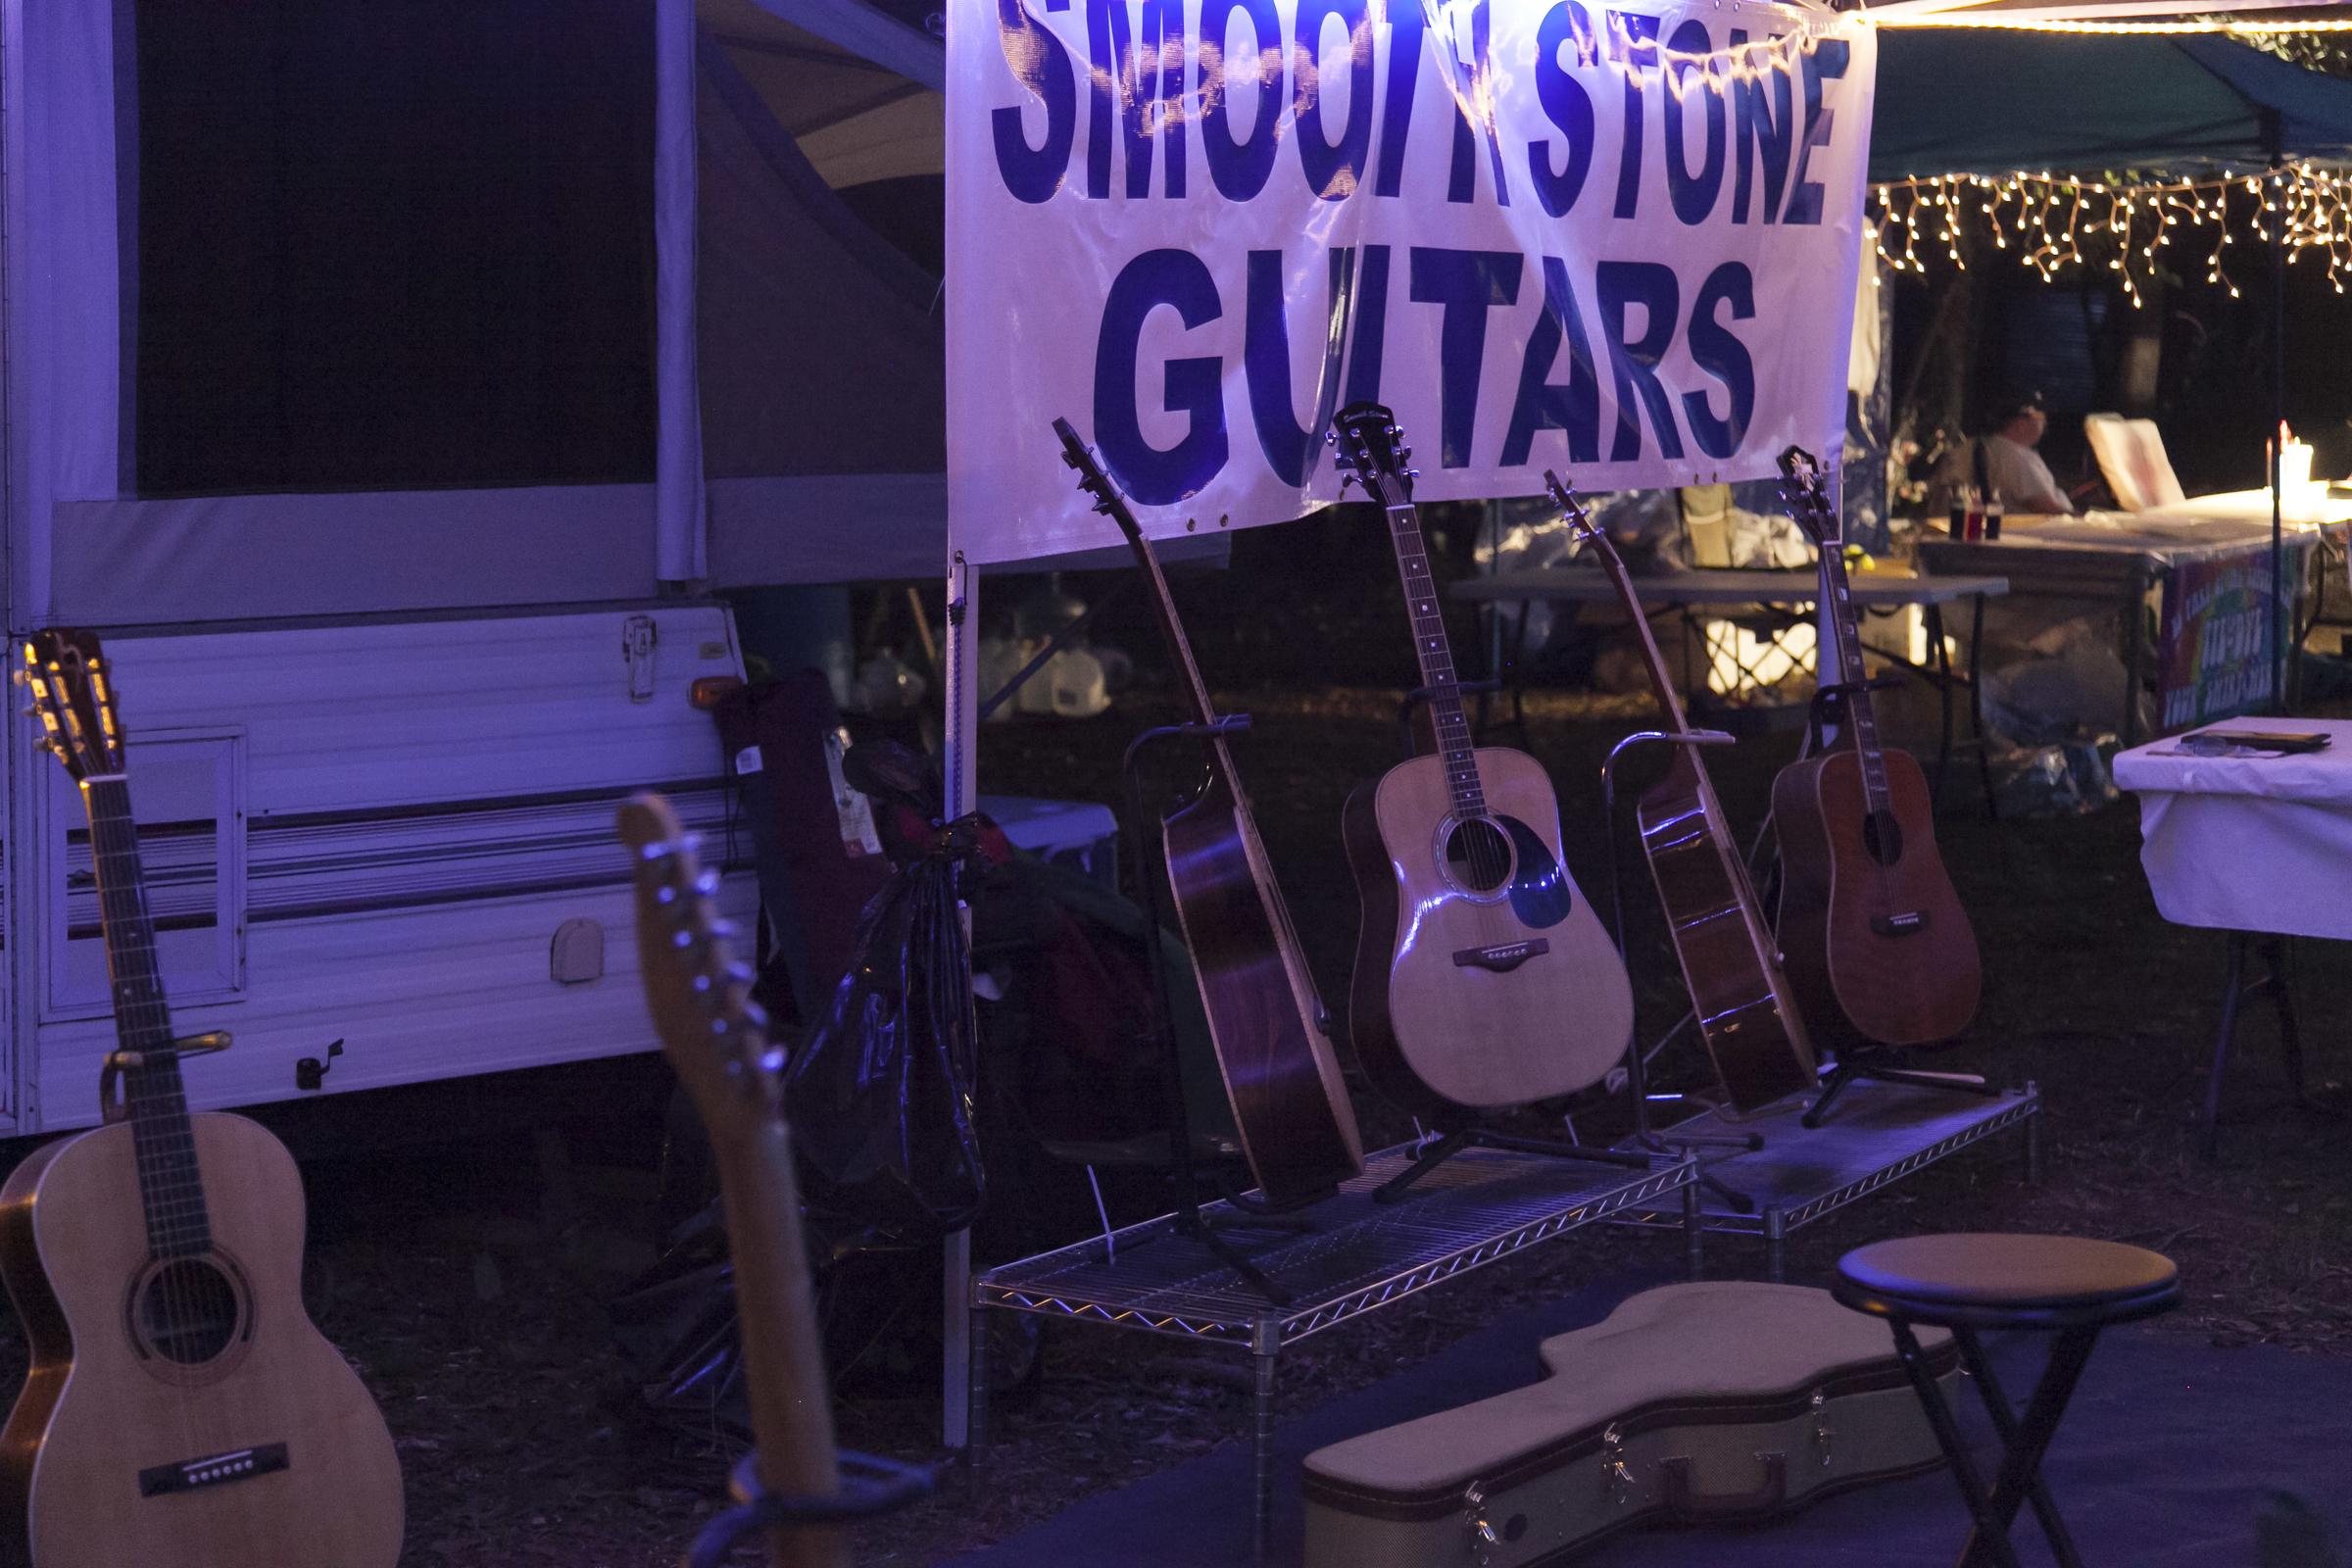 Smooth Stone Guitars.jpg